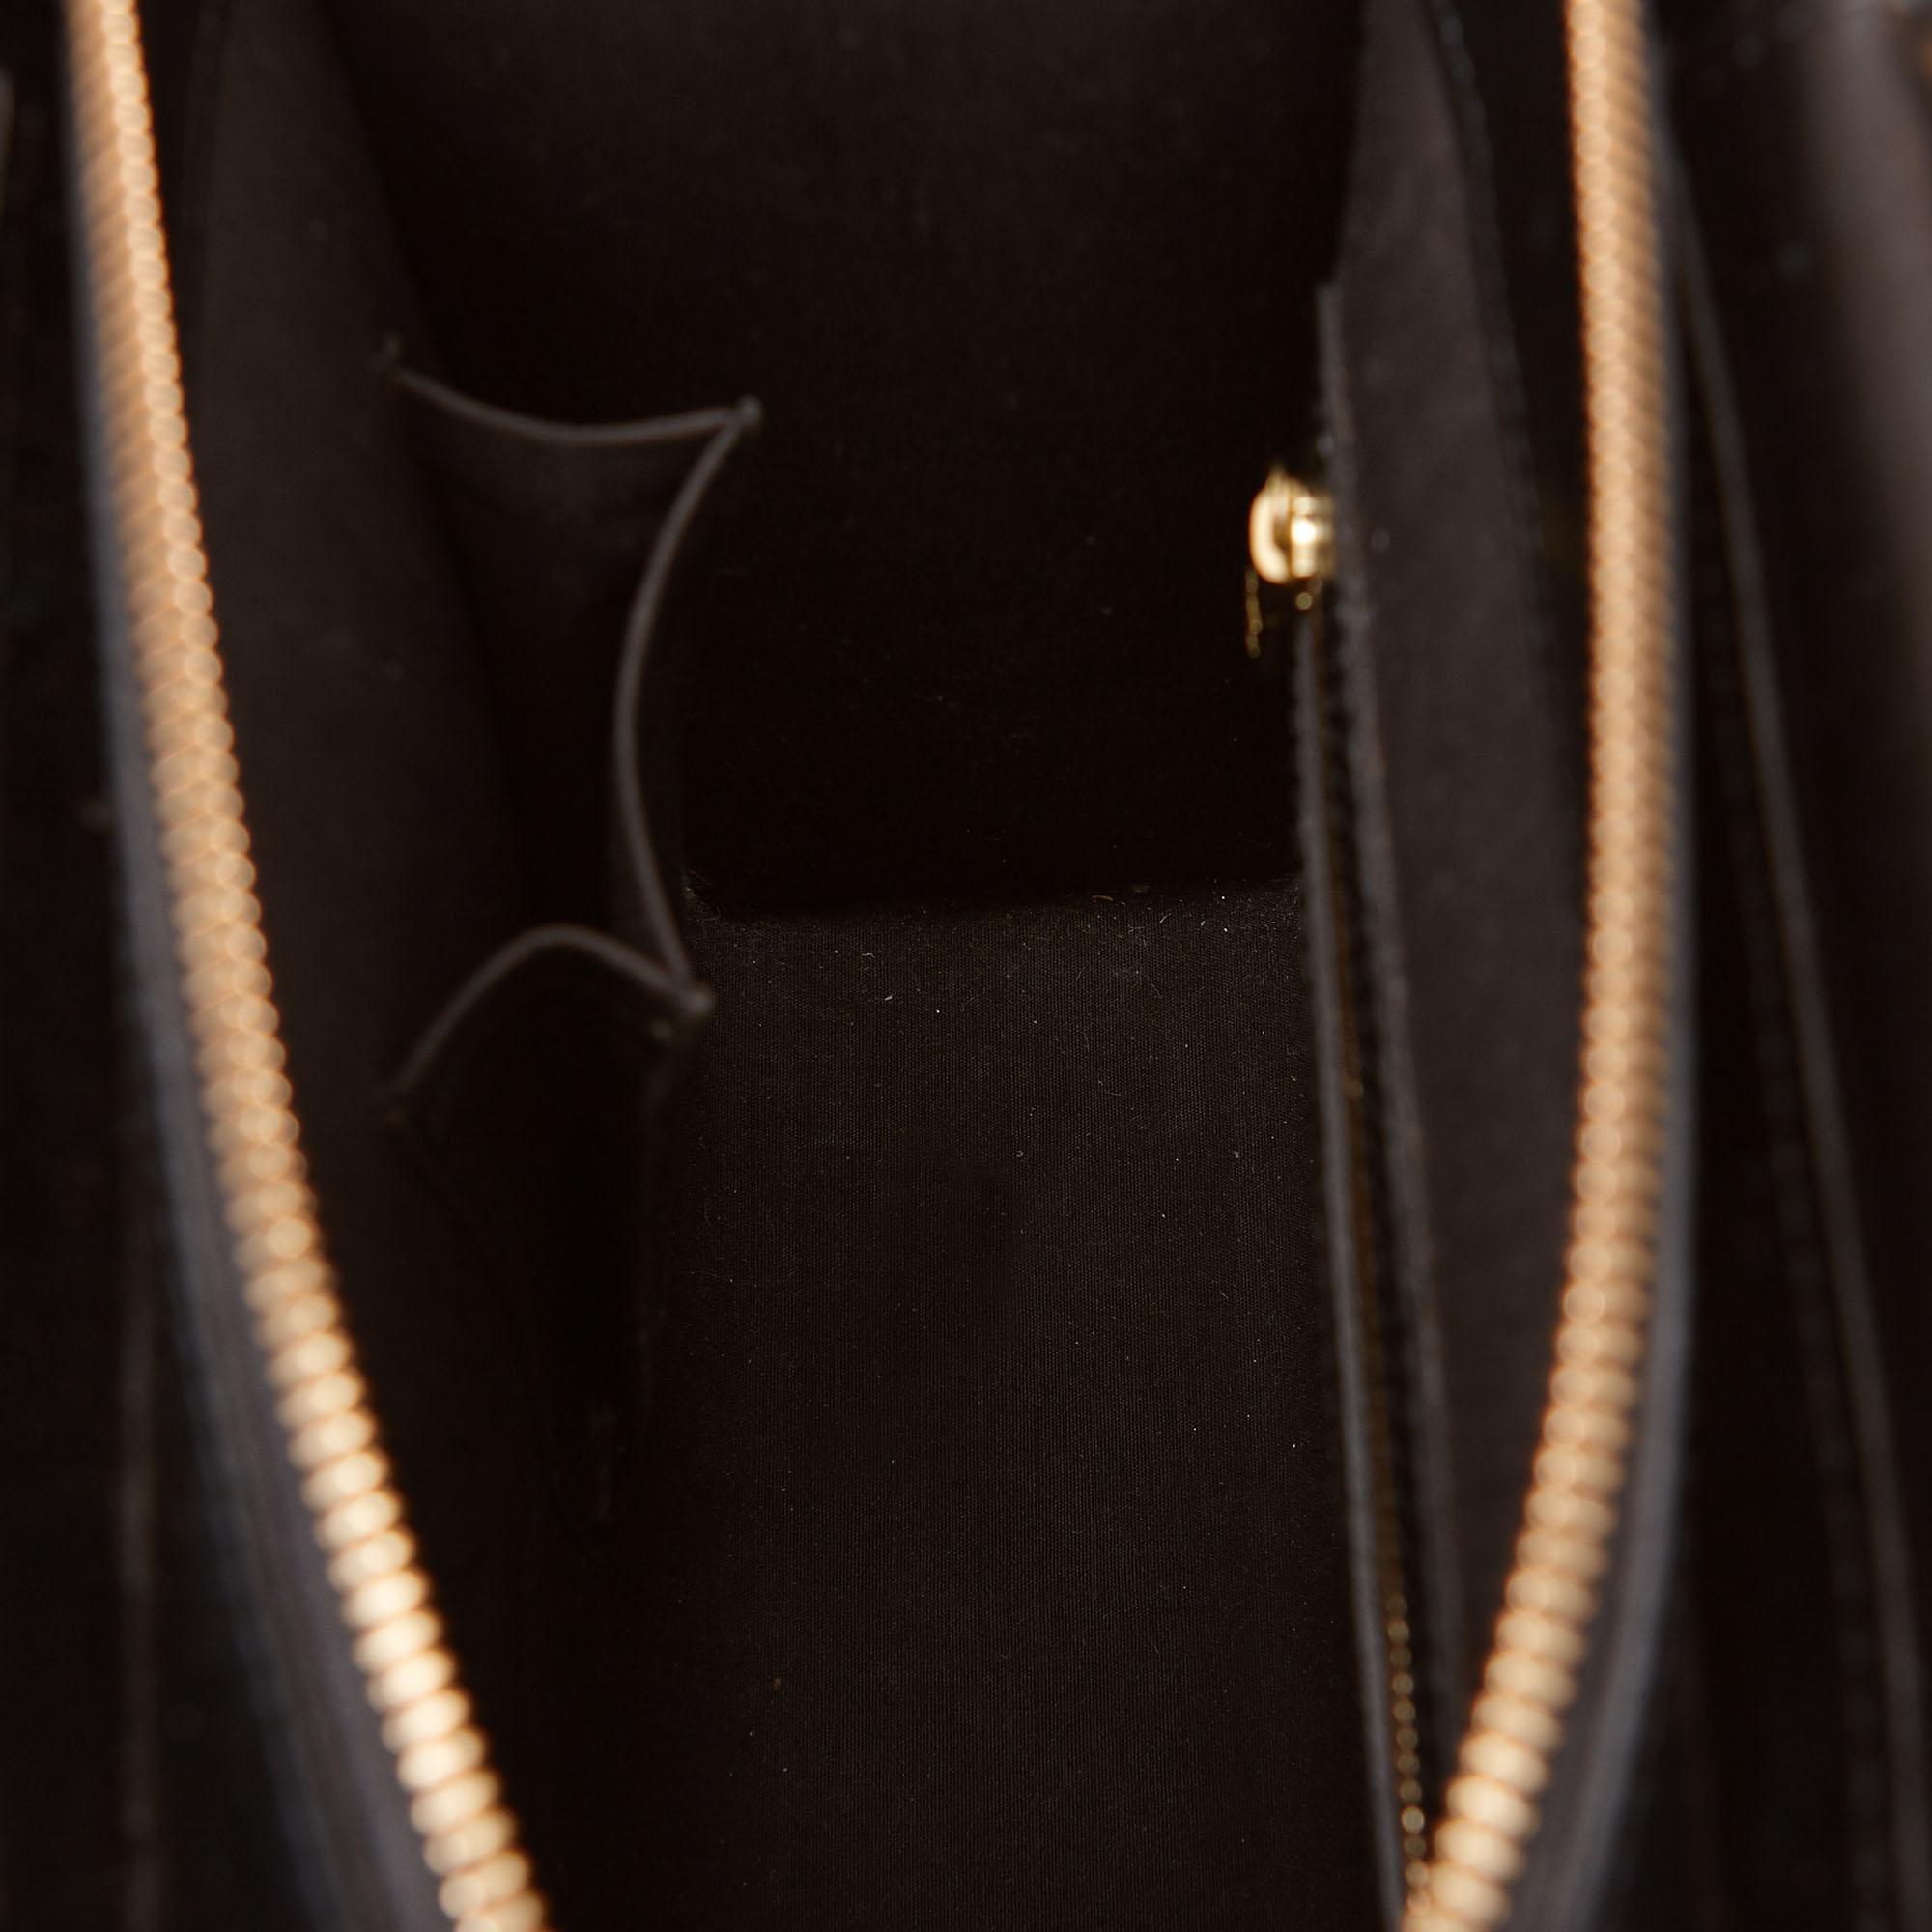 Louis Vuitton Black Epi Leather Figheri PM